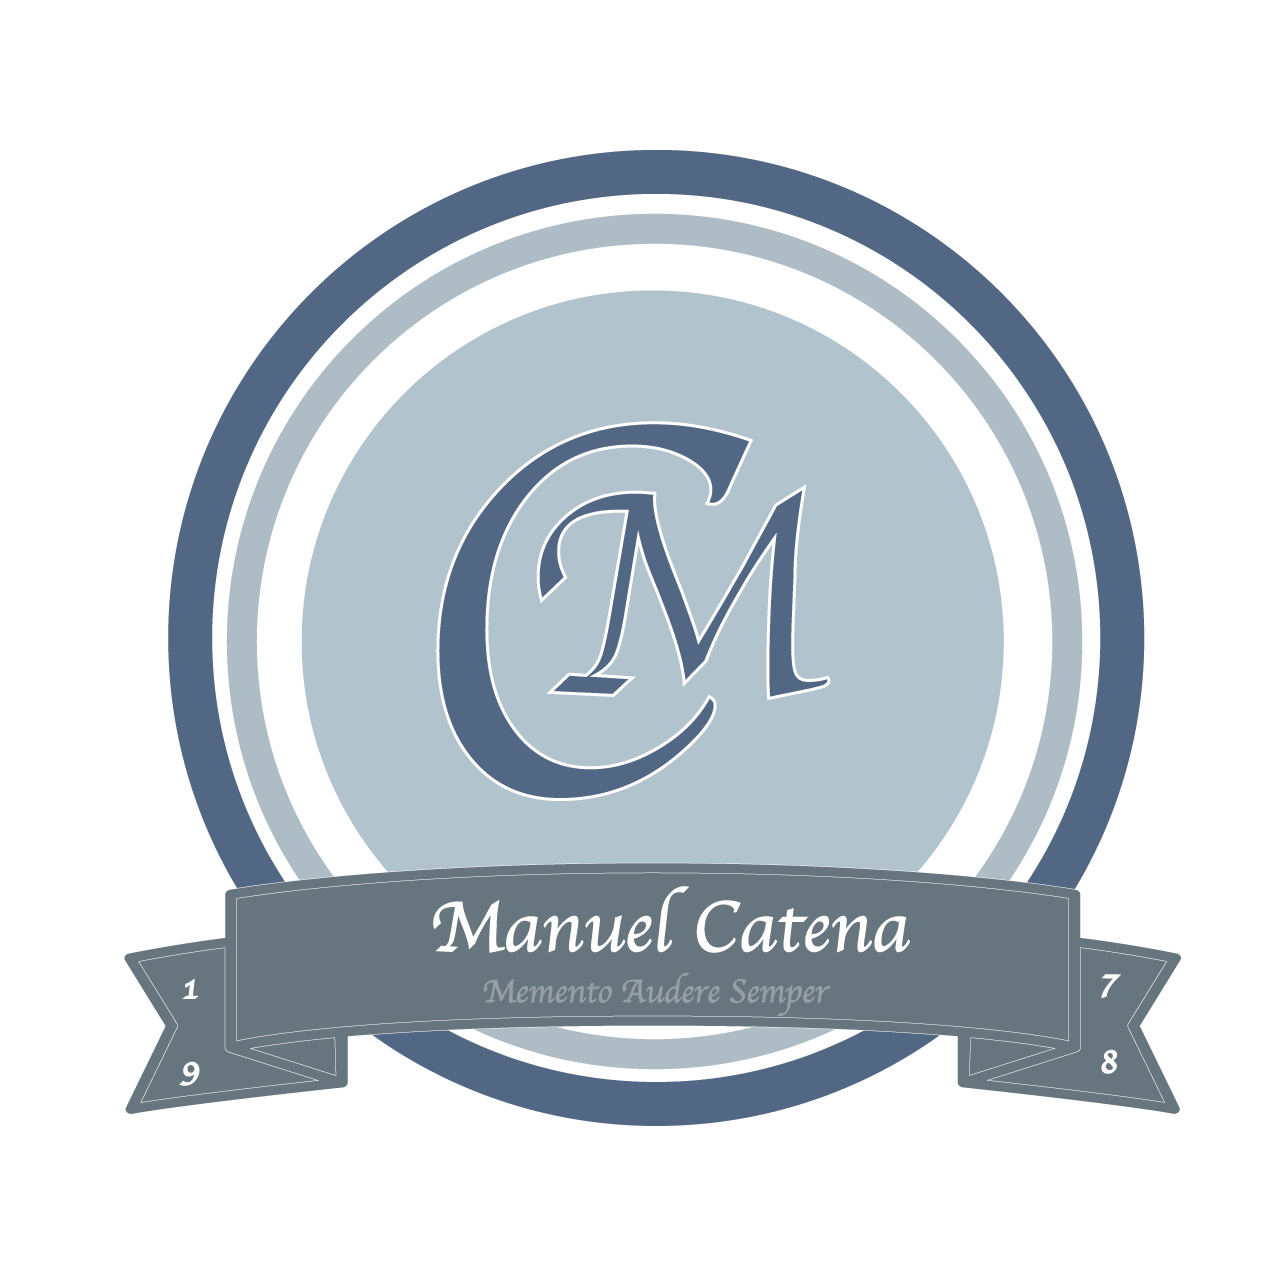 Manuel Catena